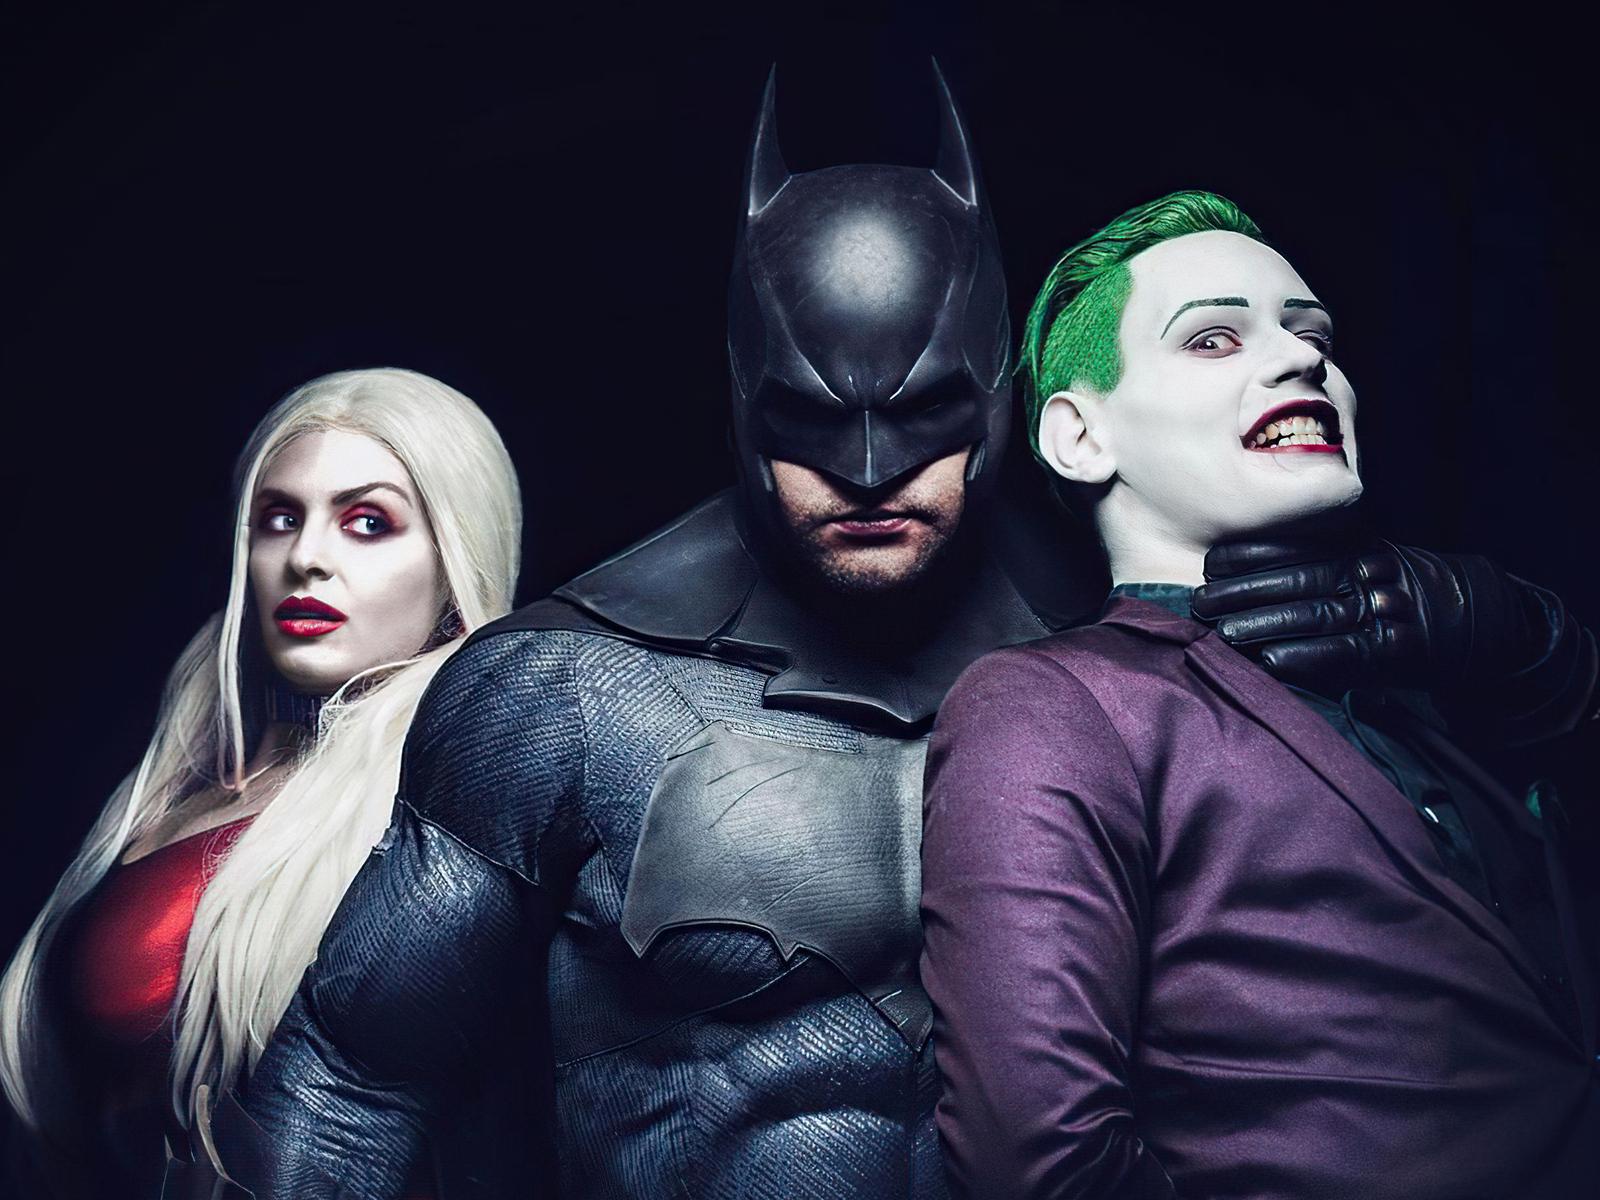 joker-batman-and-harley-quinn-cosplay-4k-hc.jpg